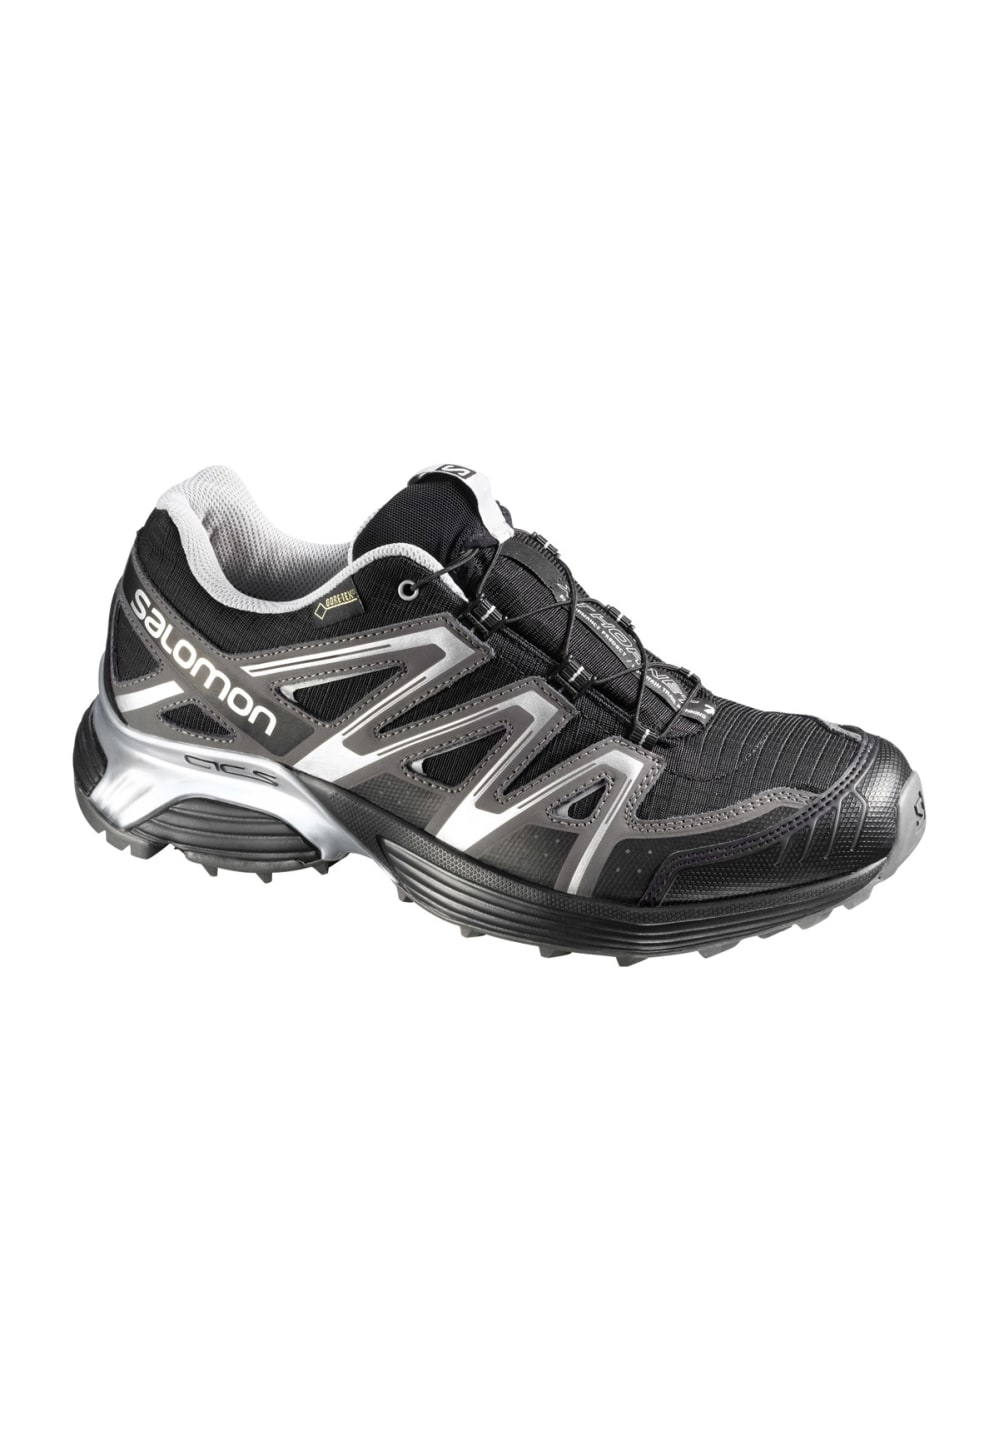 reputable site e1dda 33e35 Salomon XT Hornet GTX - Running shoes for Men - Grey.